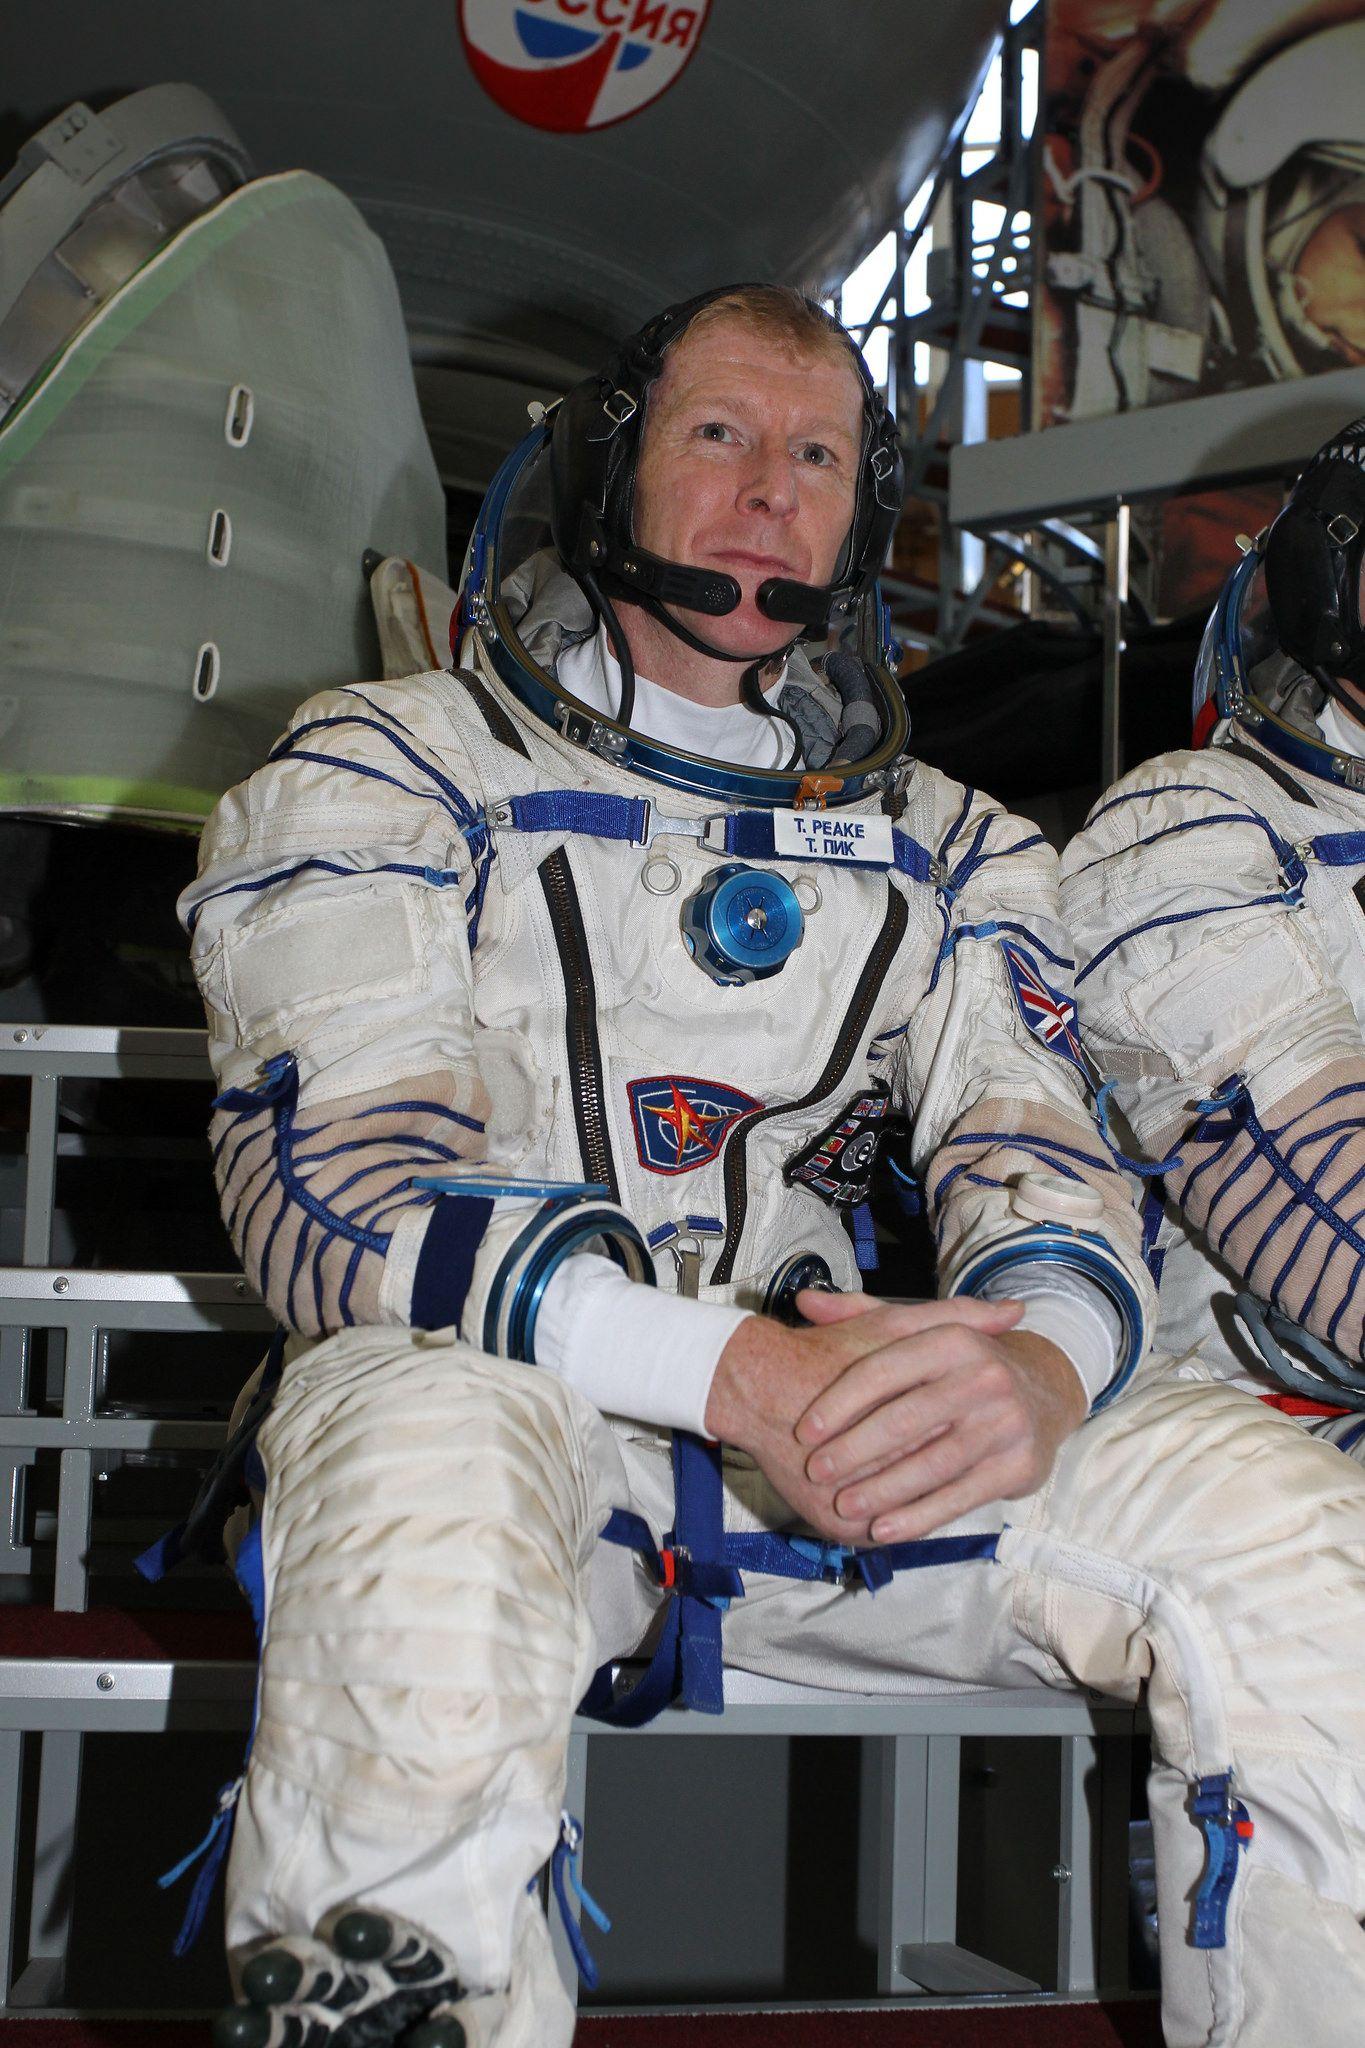 Backup Flight Engineer Timothy Peake